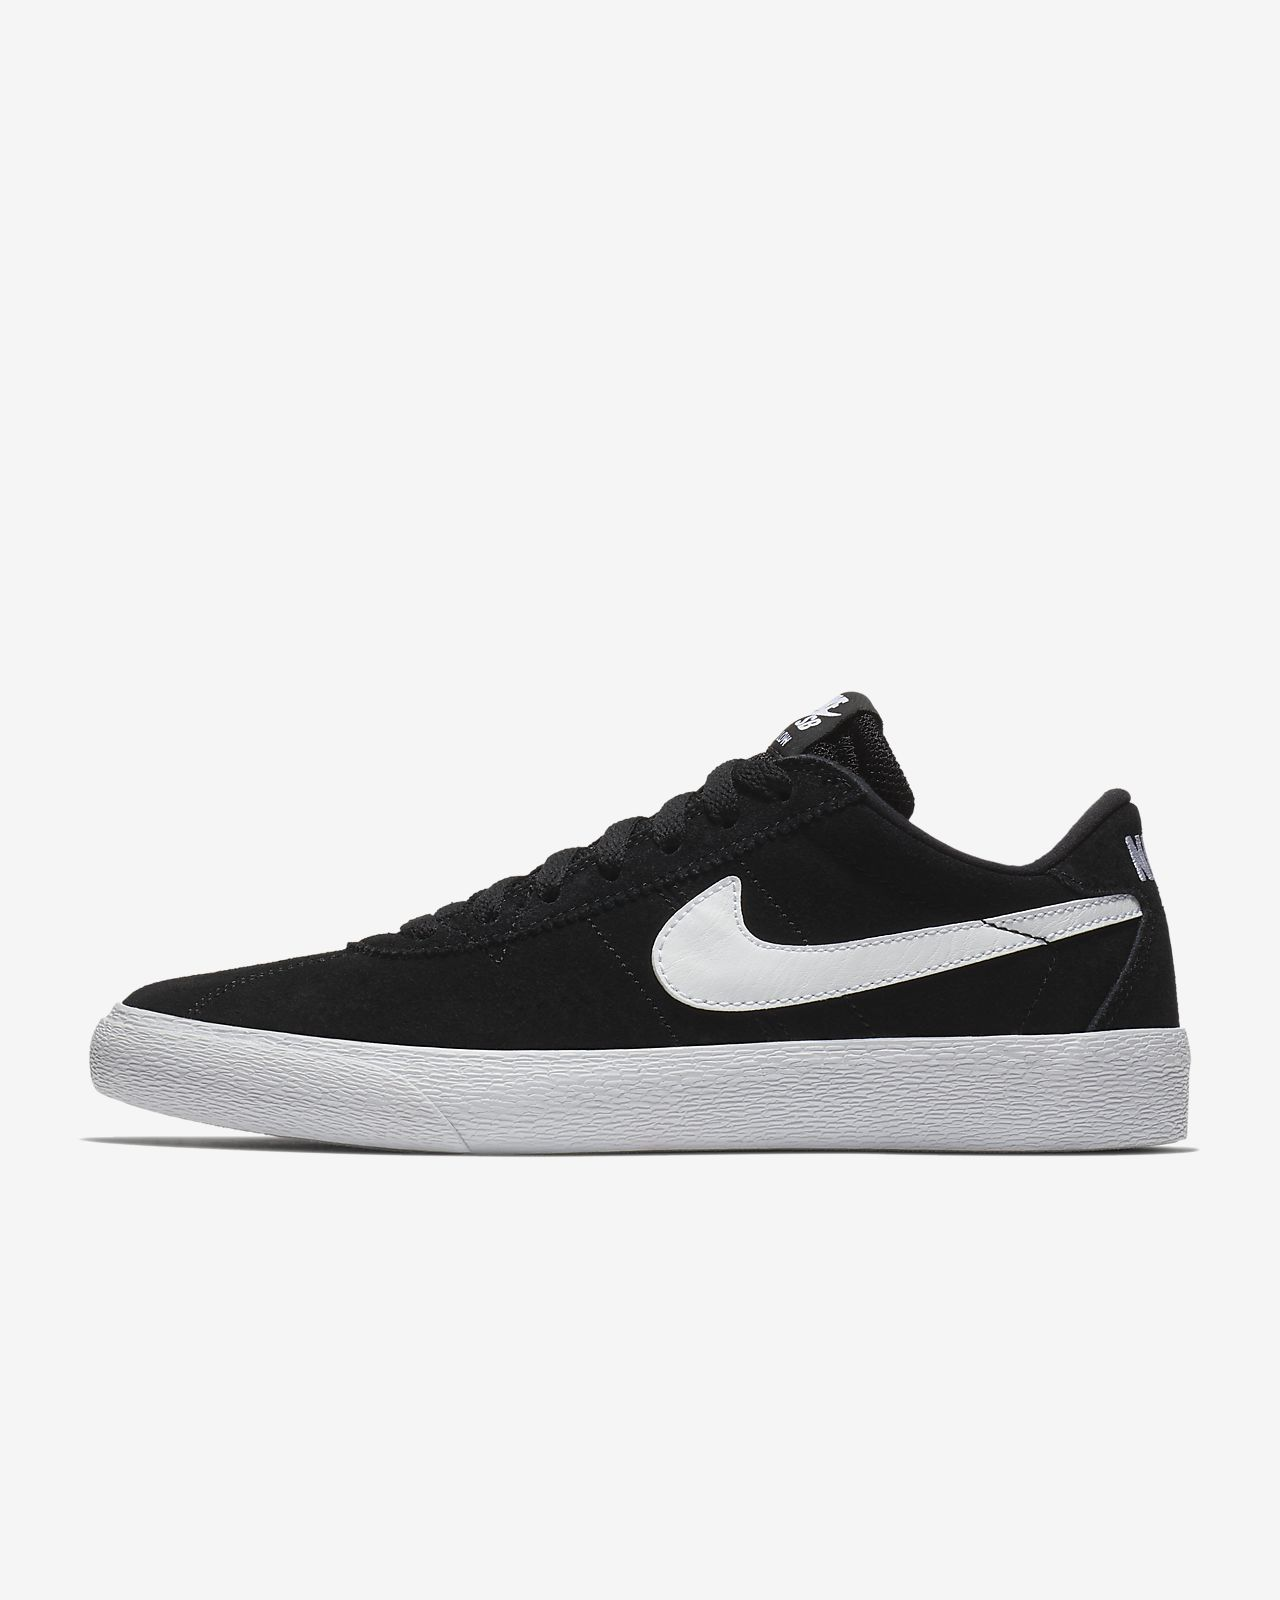 Sb Bruin Nike Ca Low Skateboard Chaussure De Pour Zoom Femme 4nvwEtqx